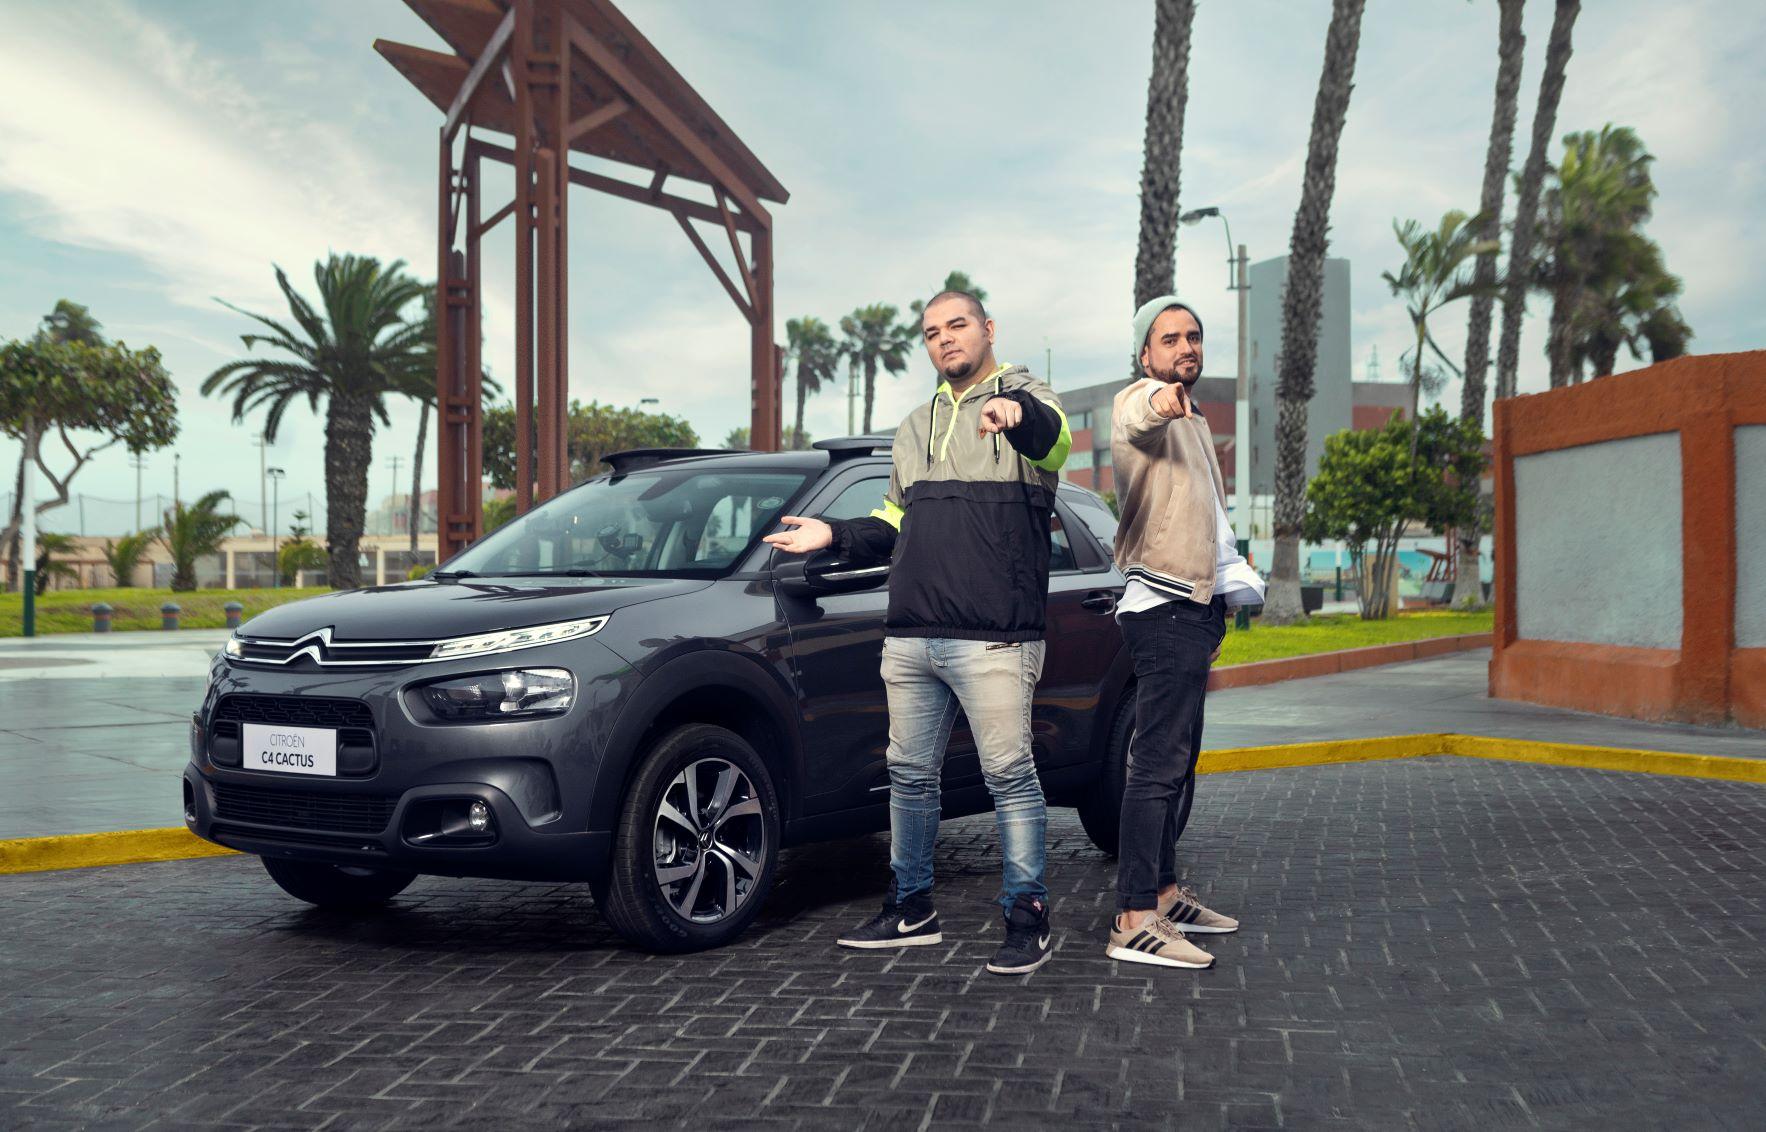 Foto de Franda, se subió está vez a la C4 Cactus de Citroën en un nuevo CË TALKS